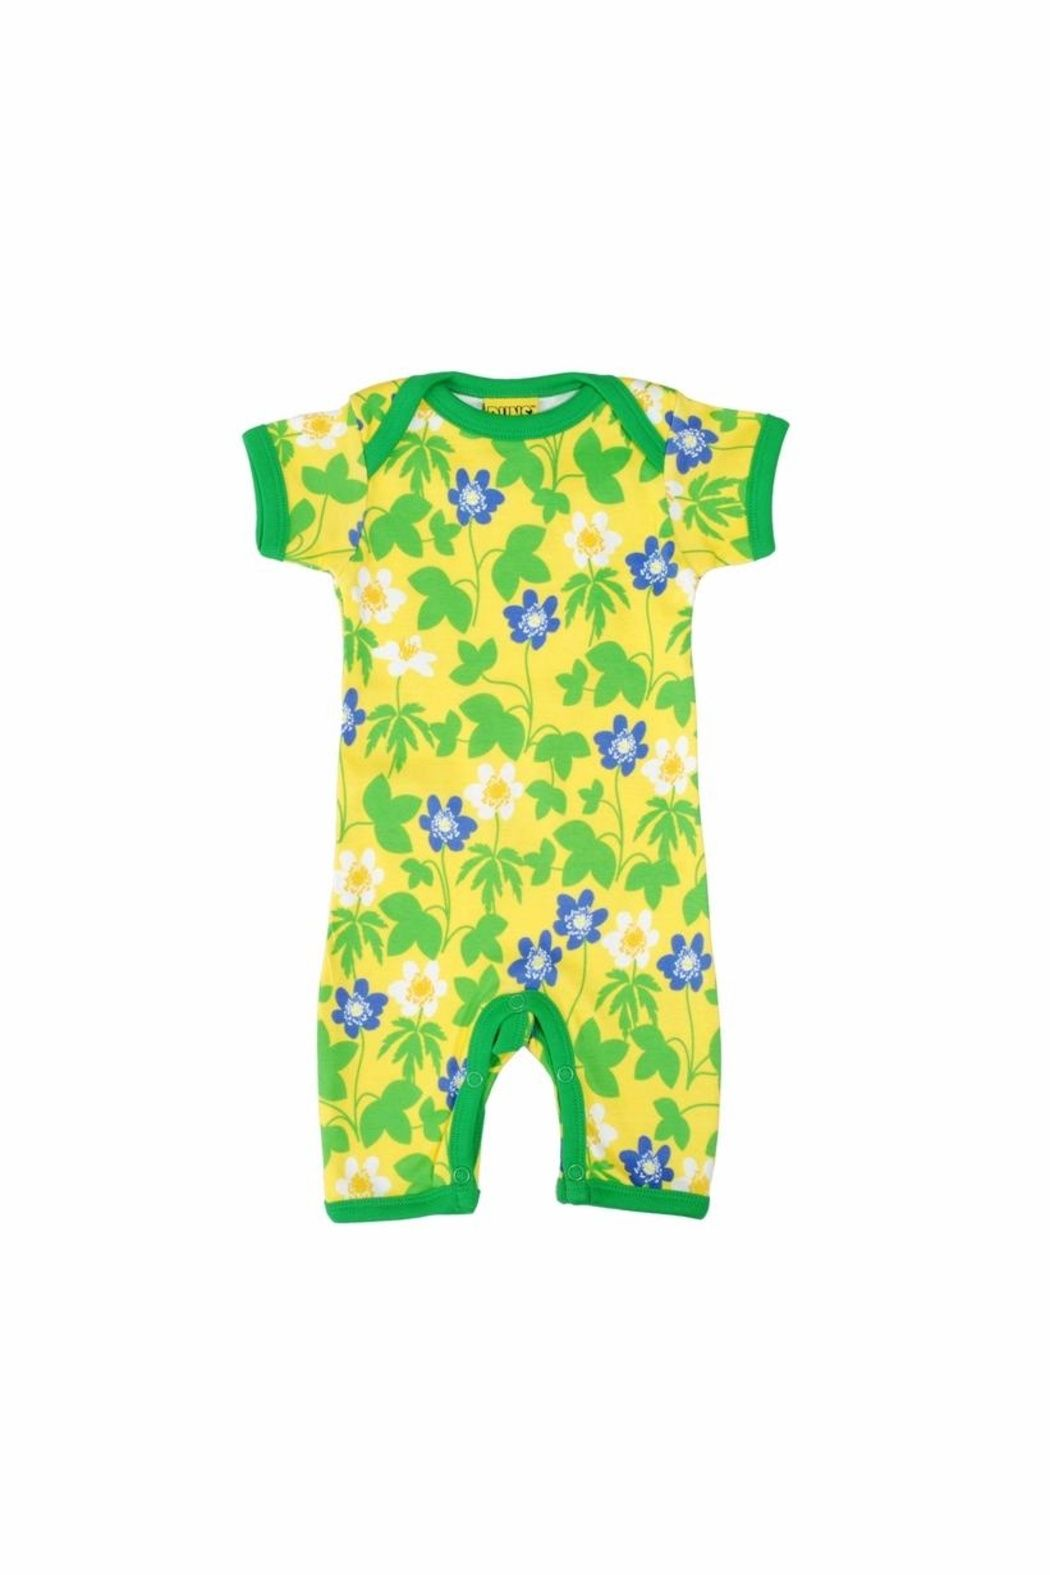 DUNS Sweden Flower Summer Suit - Main Image  3a076aa9dc7f